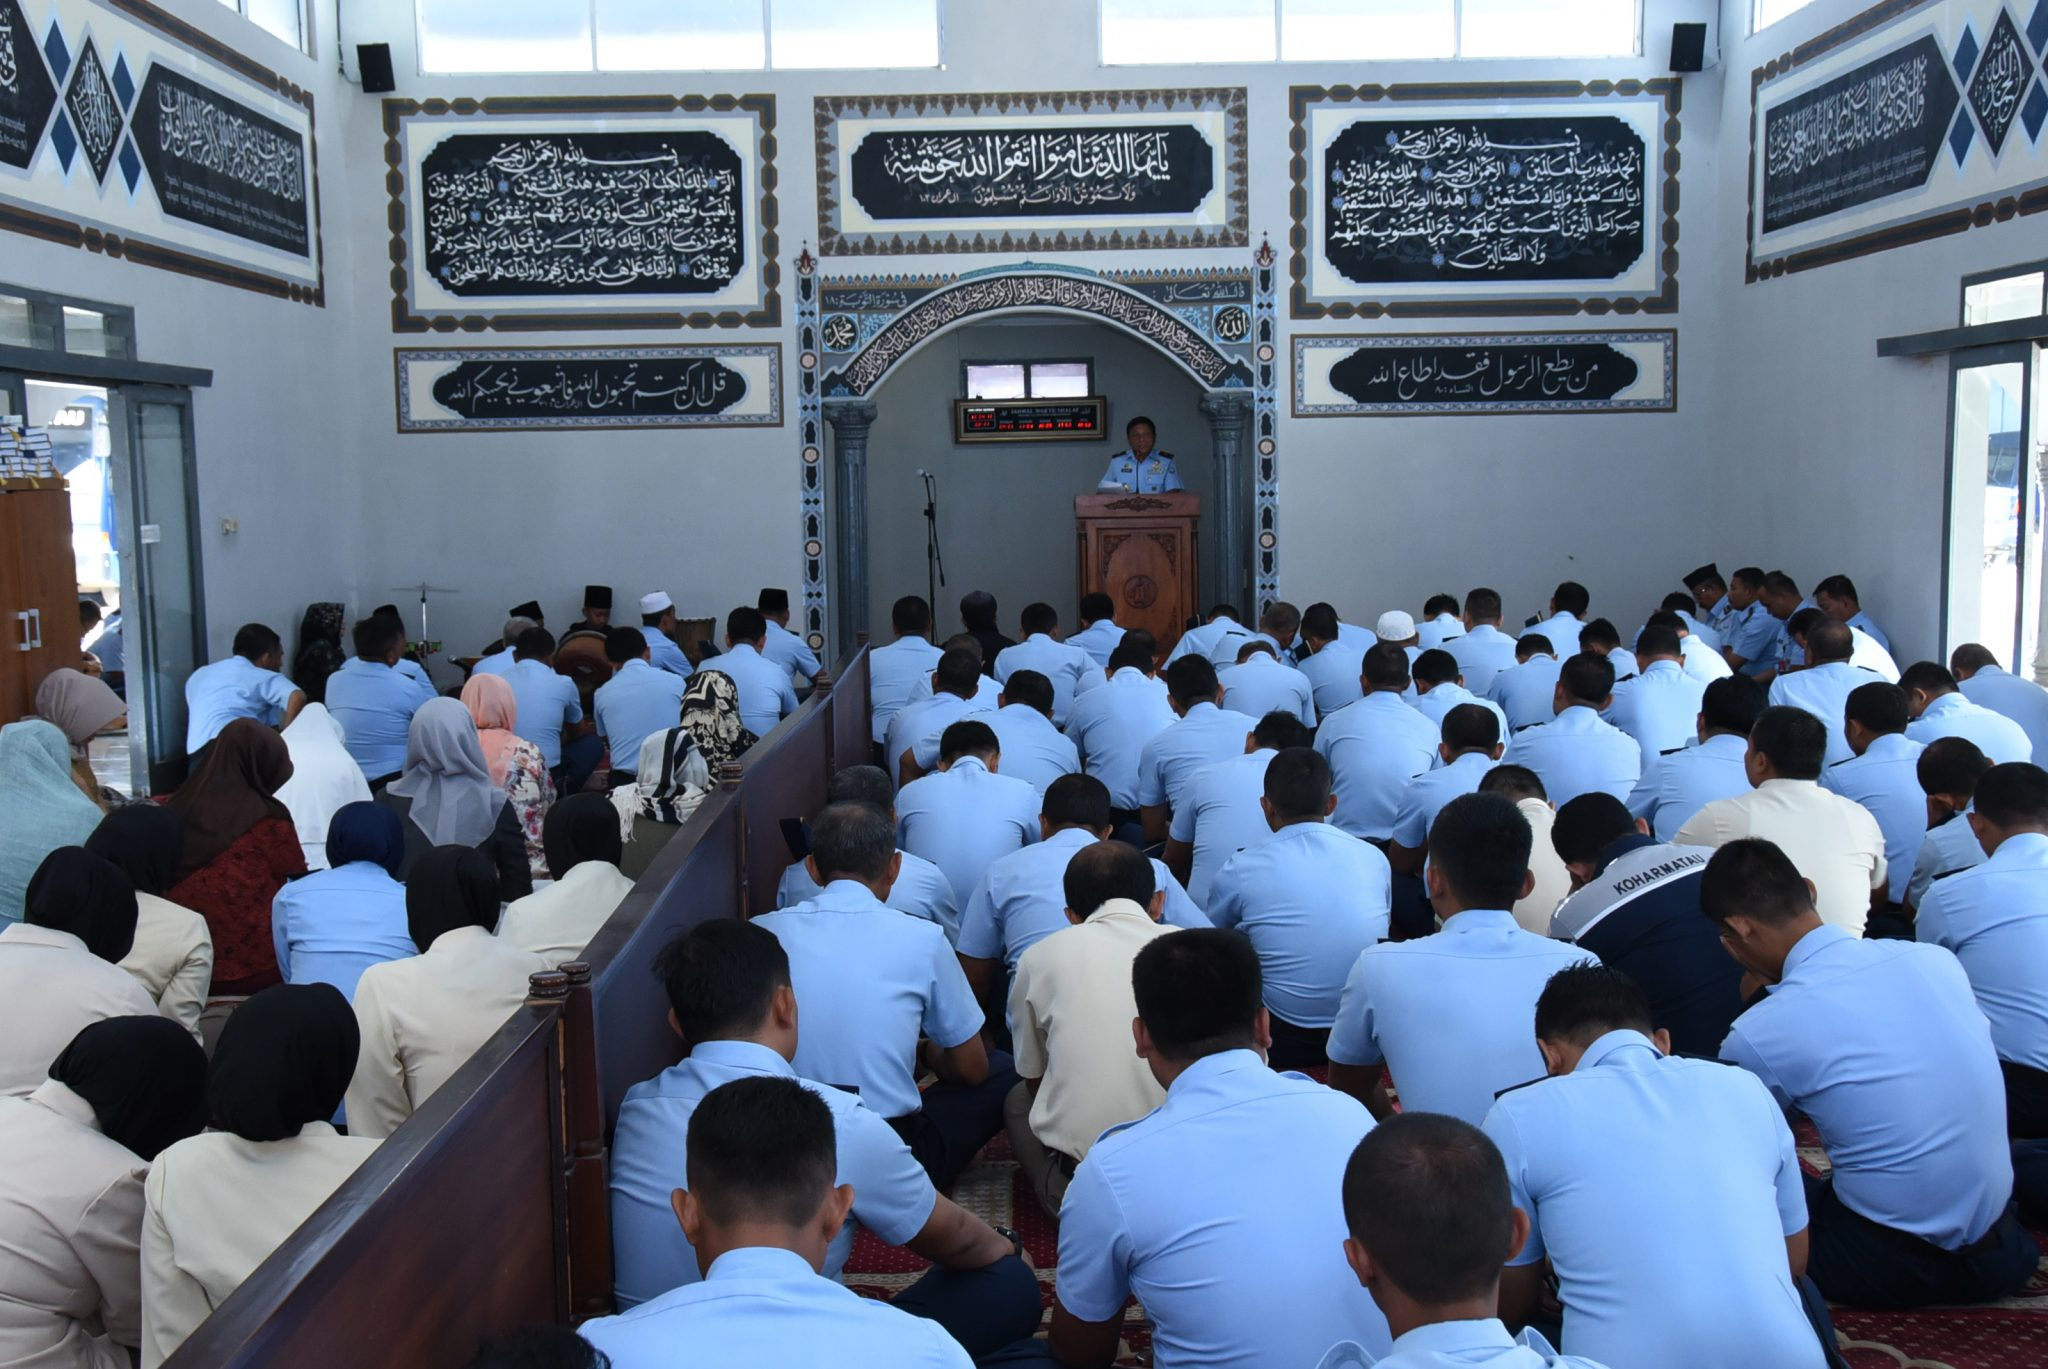 Peringatan Isra Mi'raj Nabi Muhammad Saw 1439 H/2018 M, di Mako Koharmatau